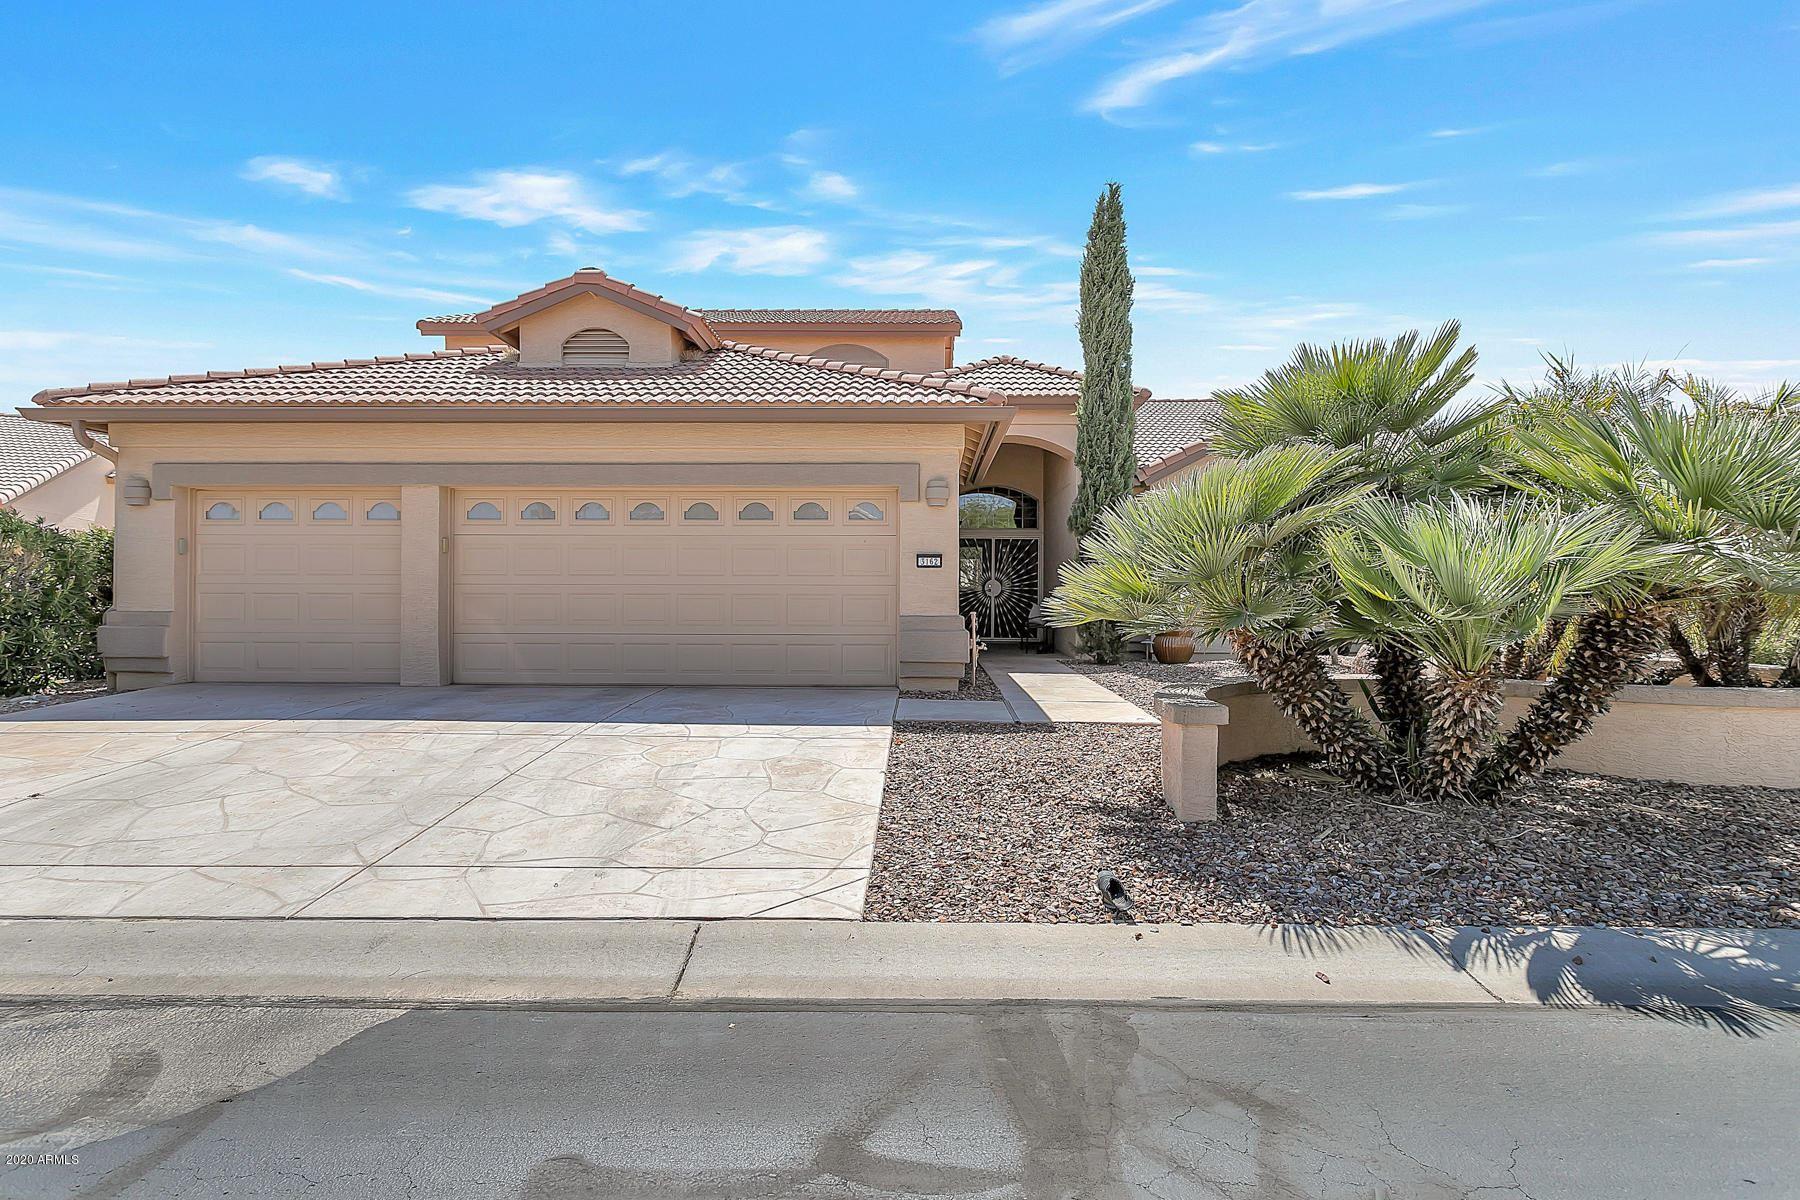 3162 N 150TH Drive, Goodyear, AZ 85395 - MLS#: 6111787